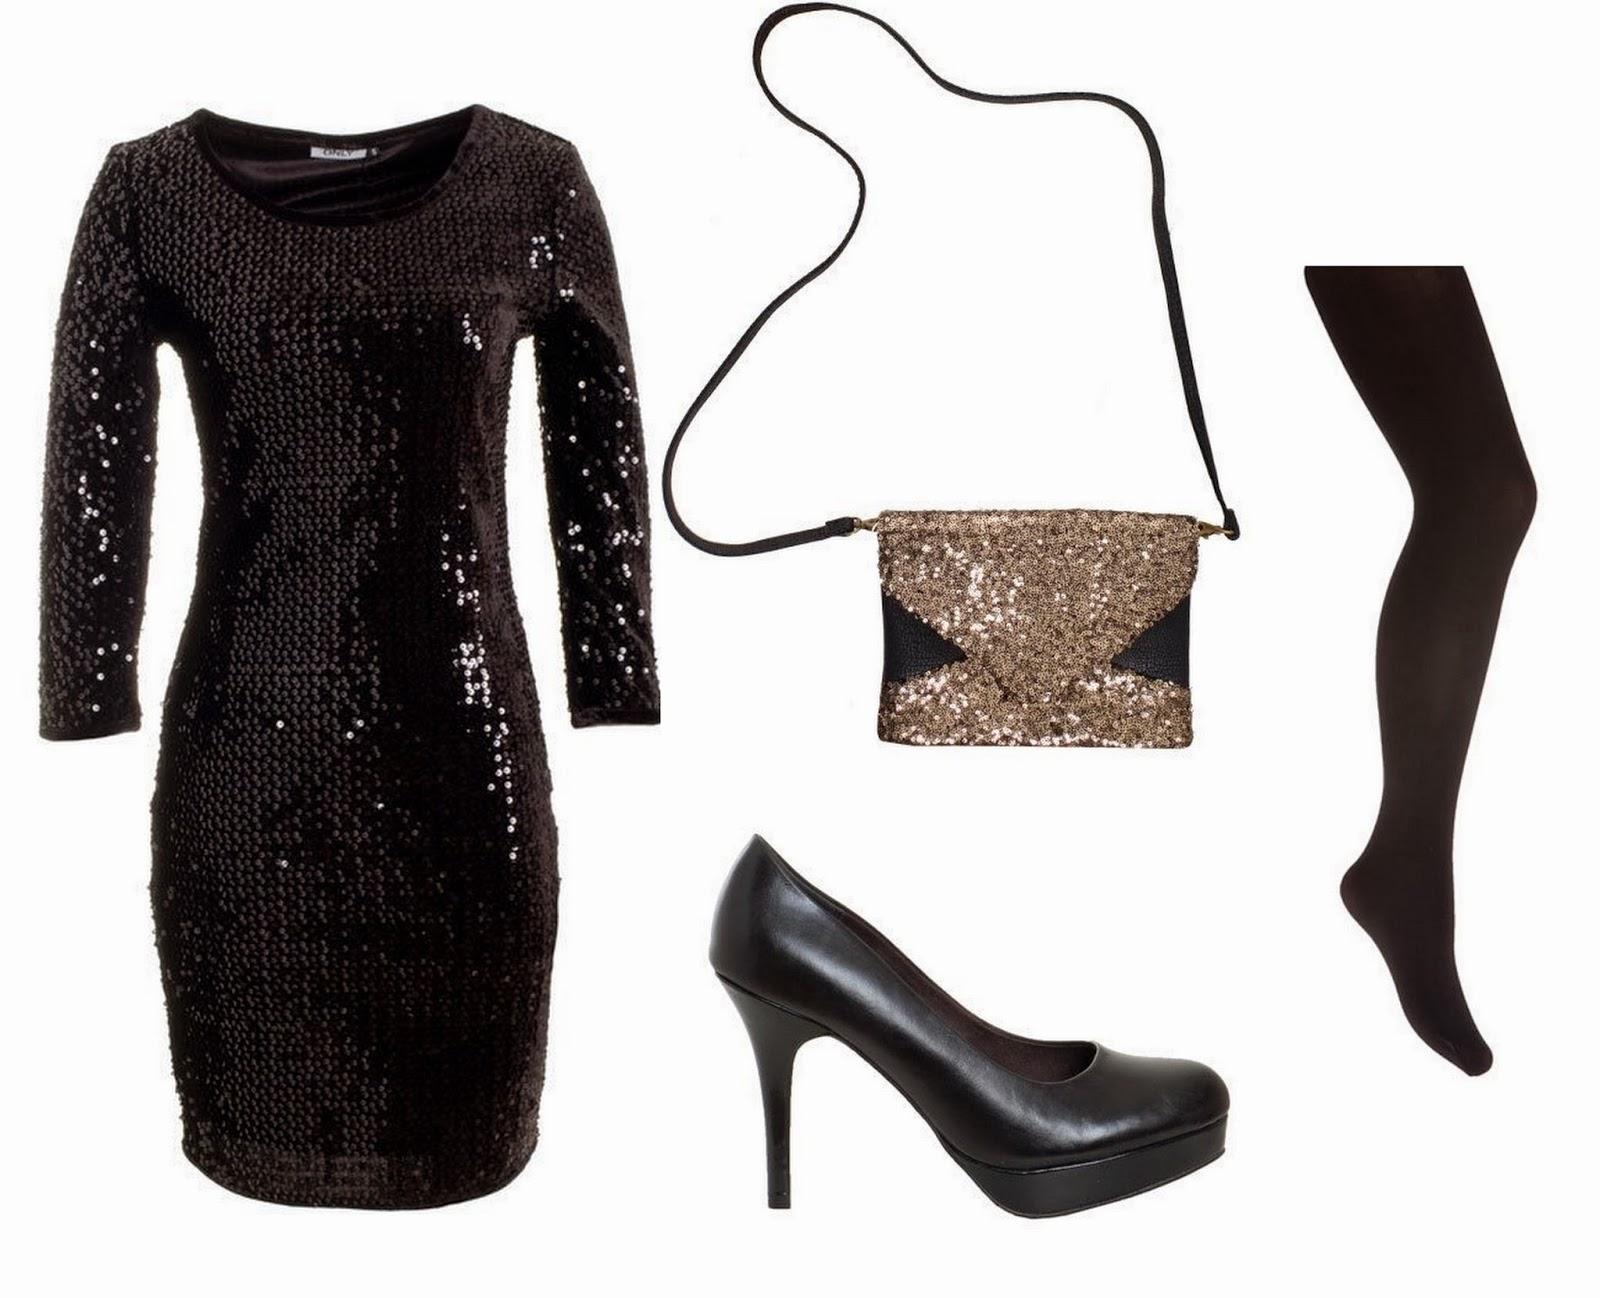 zwarte jurk met pailletten